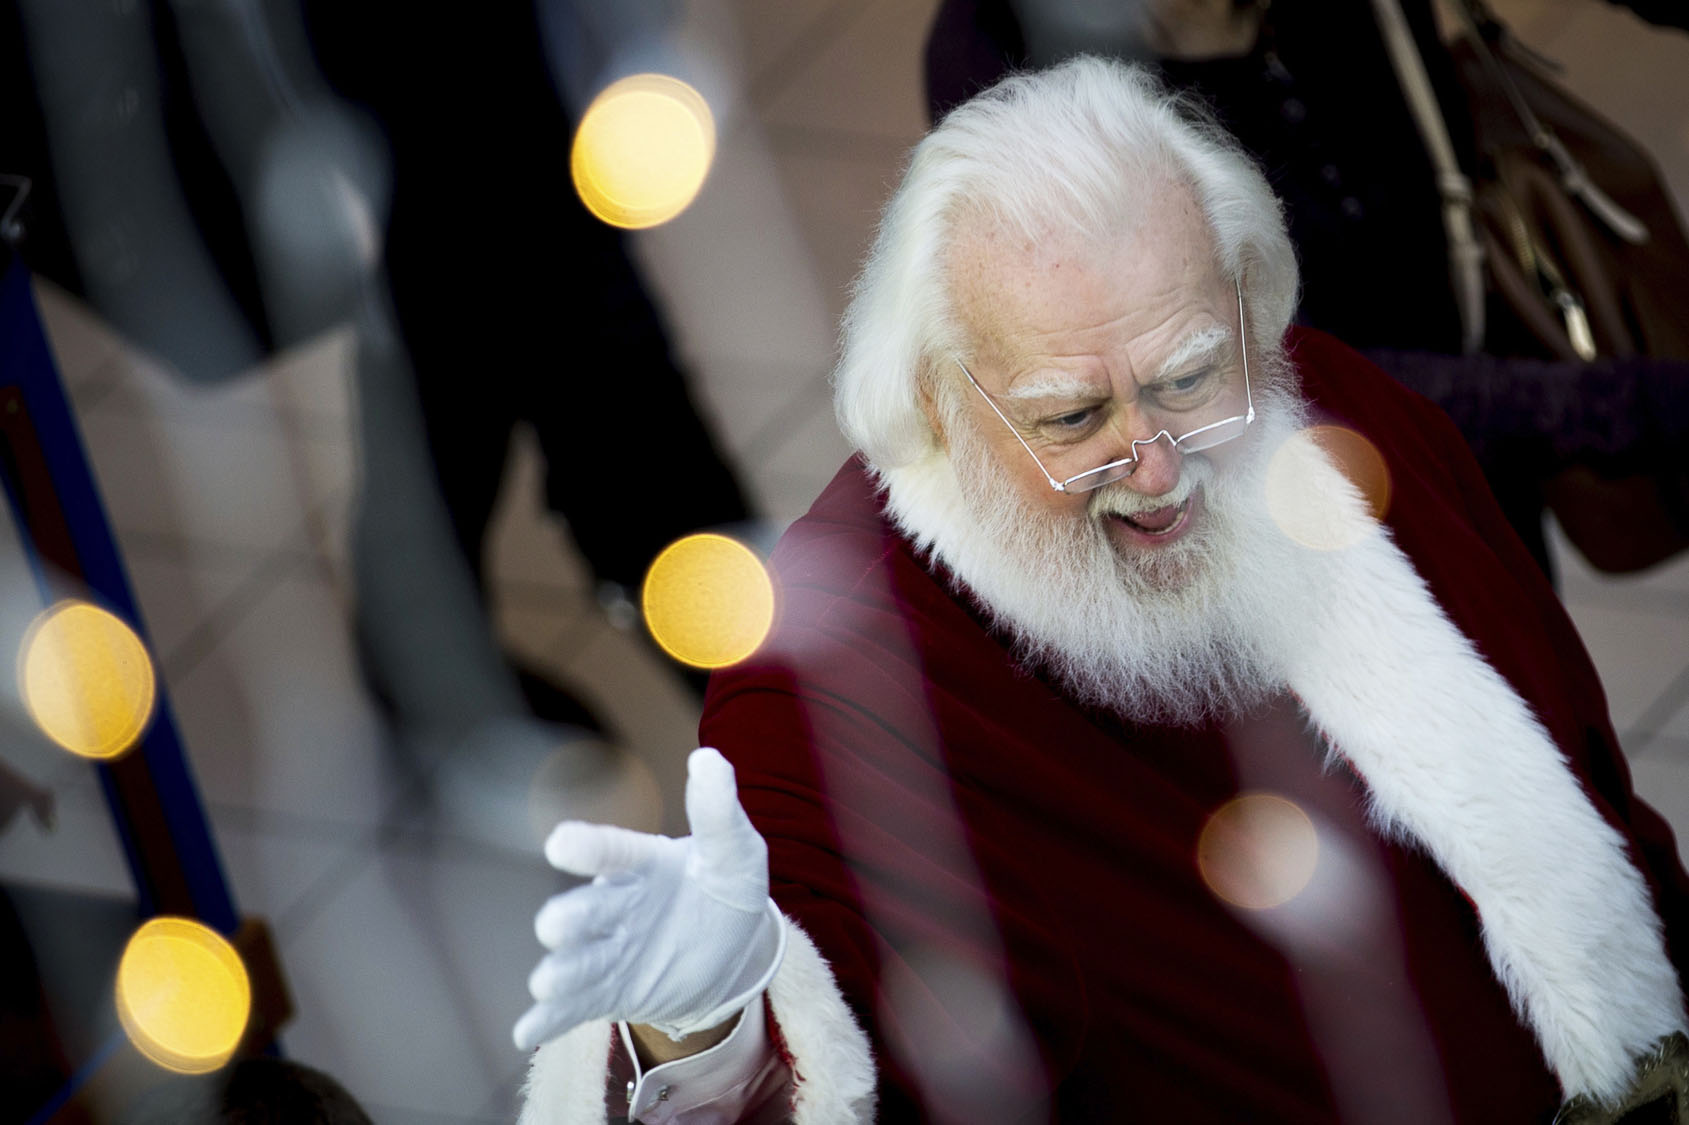 Mall Santas get makeover